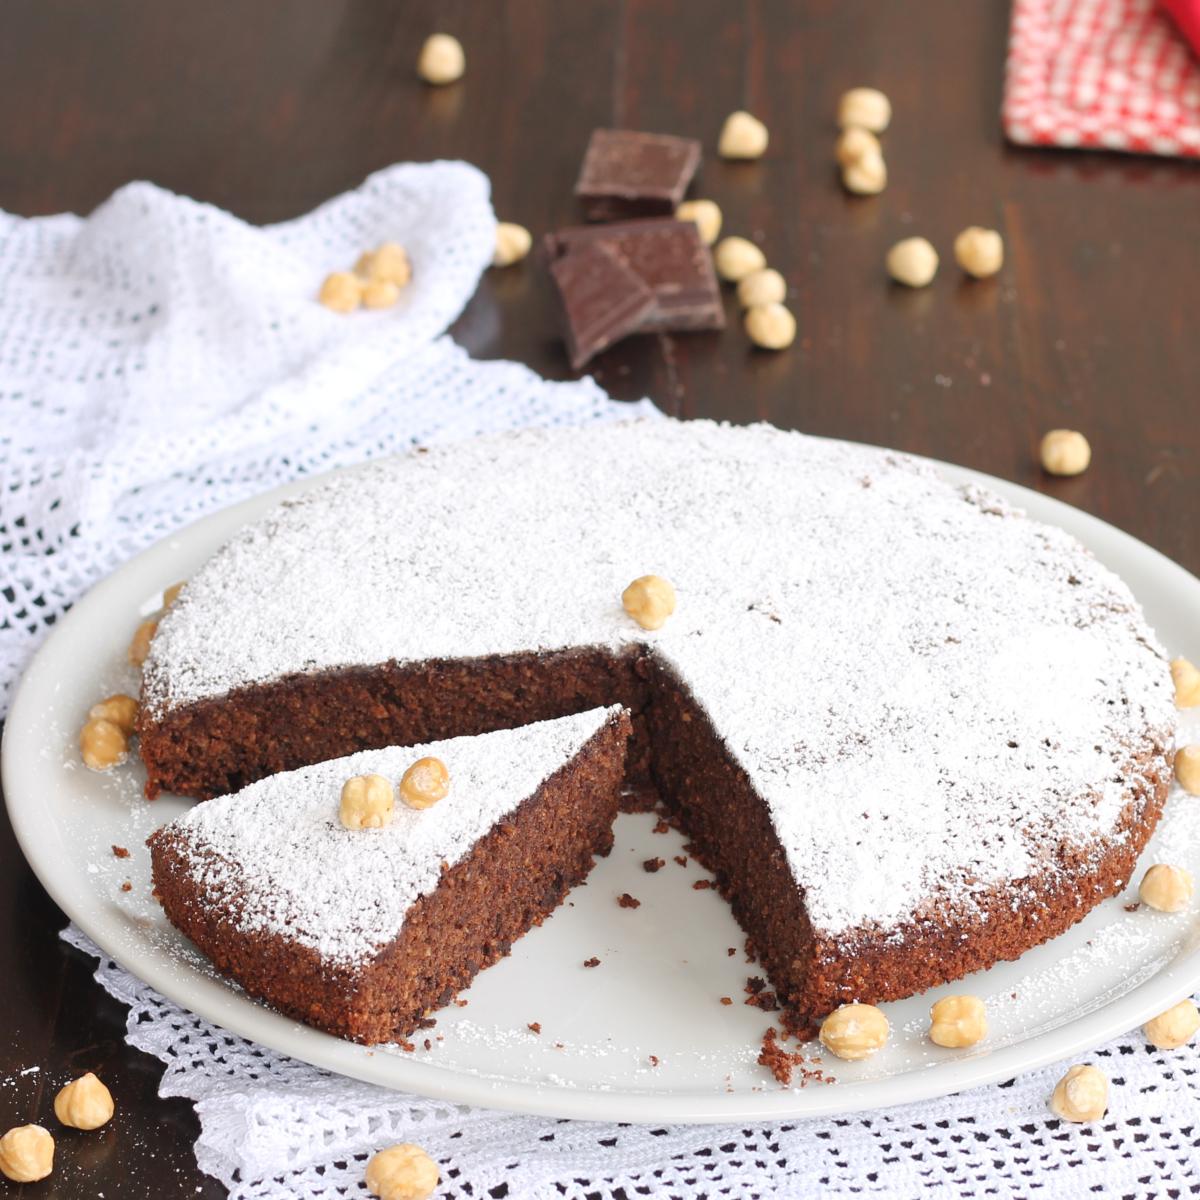 TORTA CAPRESE ALLE NOCCIOLE ricetta torta caprese senza burro